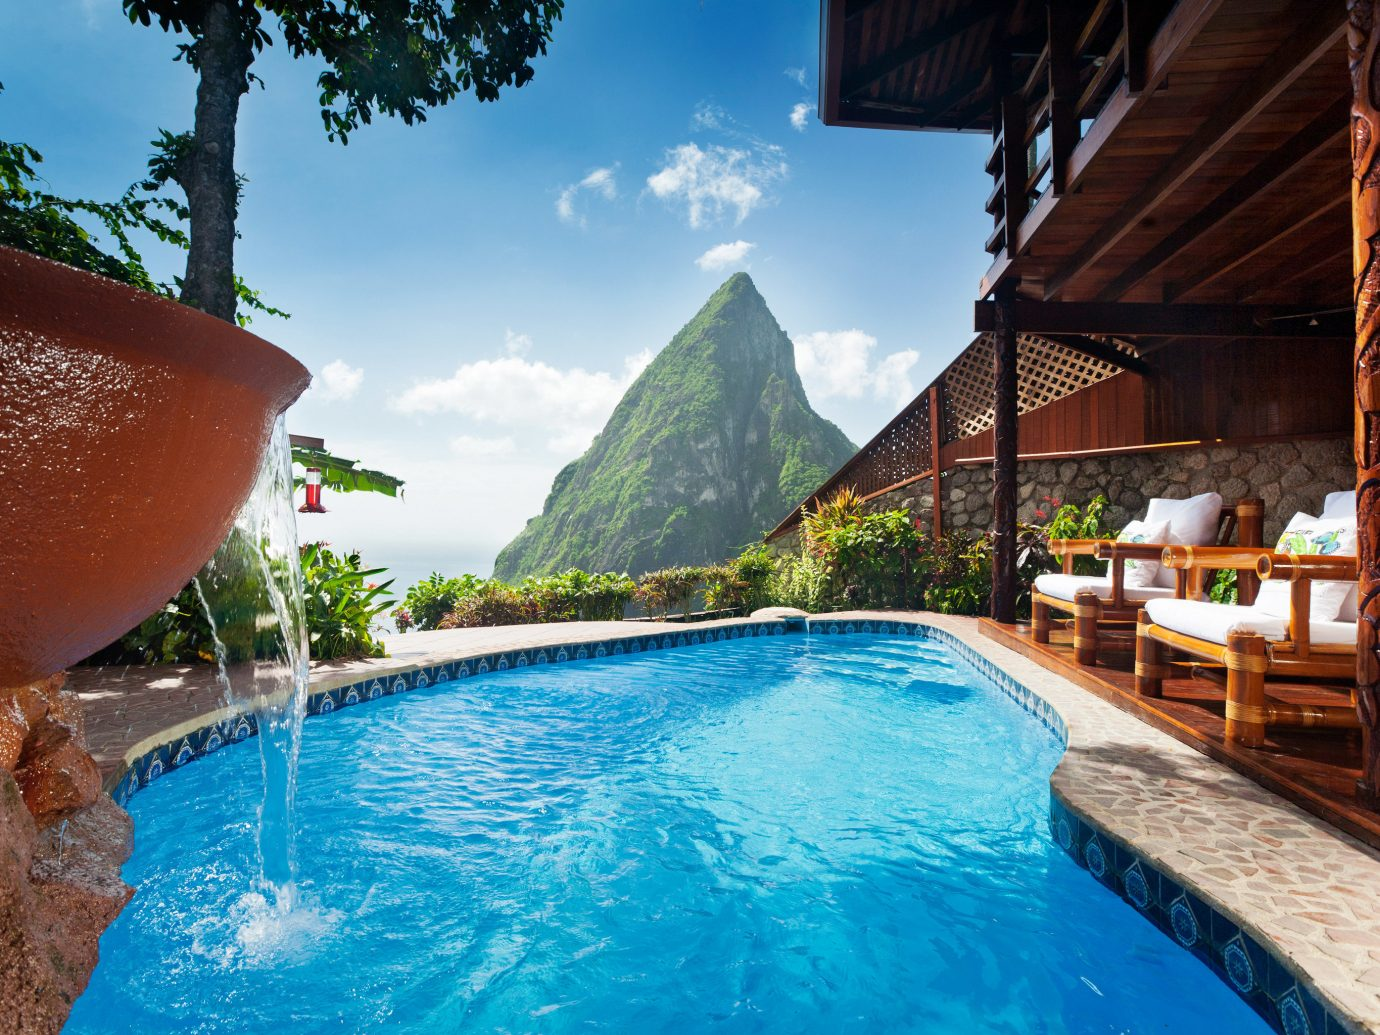 Hotels sky water swimming pool leisure Resort vacation estate Pool resort town Villa backyard swimming